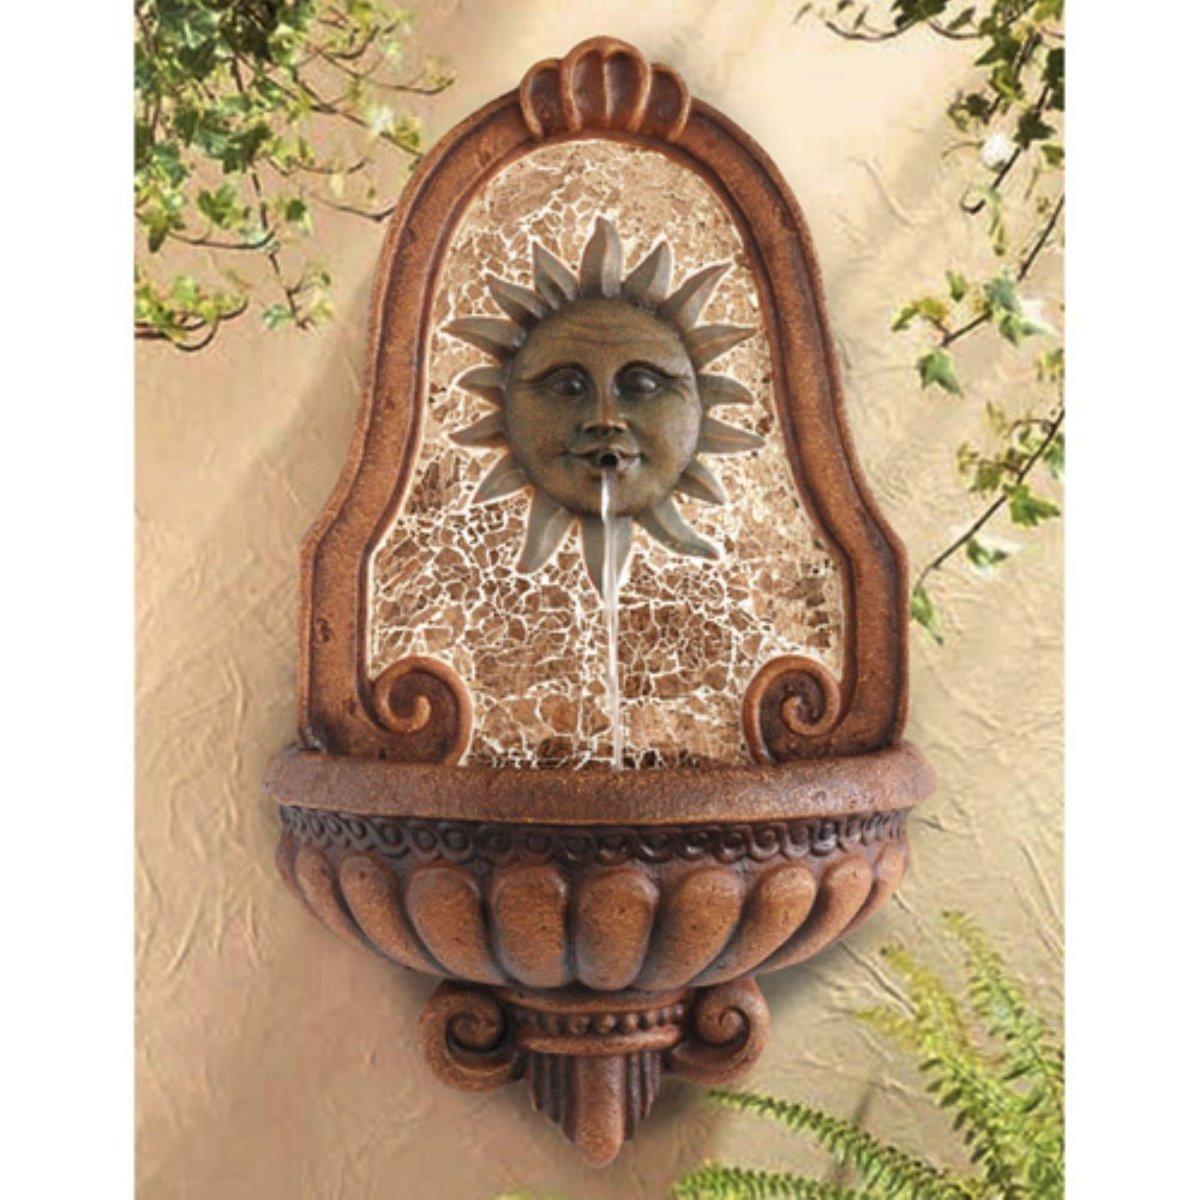 Alfresco Home Del Sol Wall Outdoor Fountain, Resin & Fiberglass